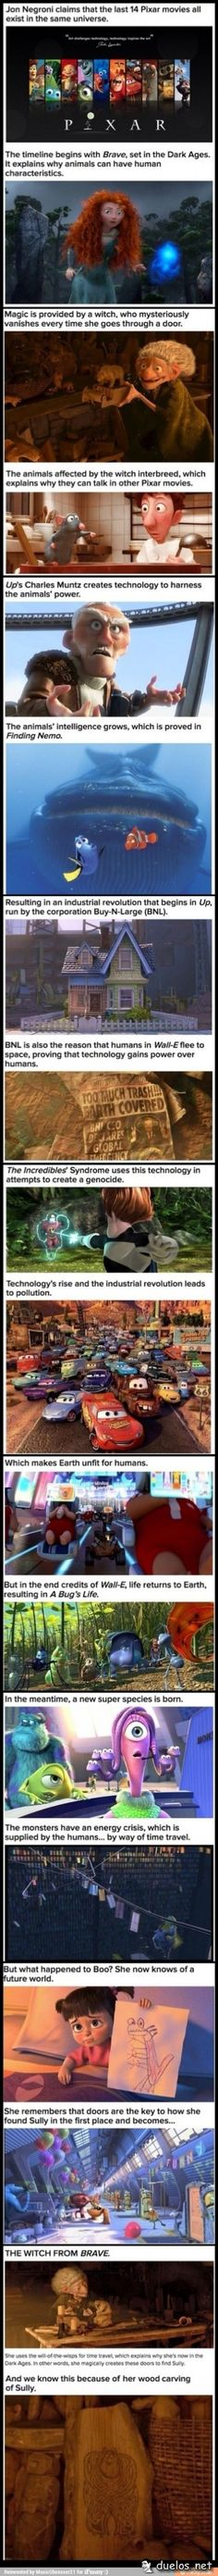 Pixar Hypothesis - ERRRRMMMMEEEGGGHHHHEEERRRRRDDDDD